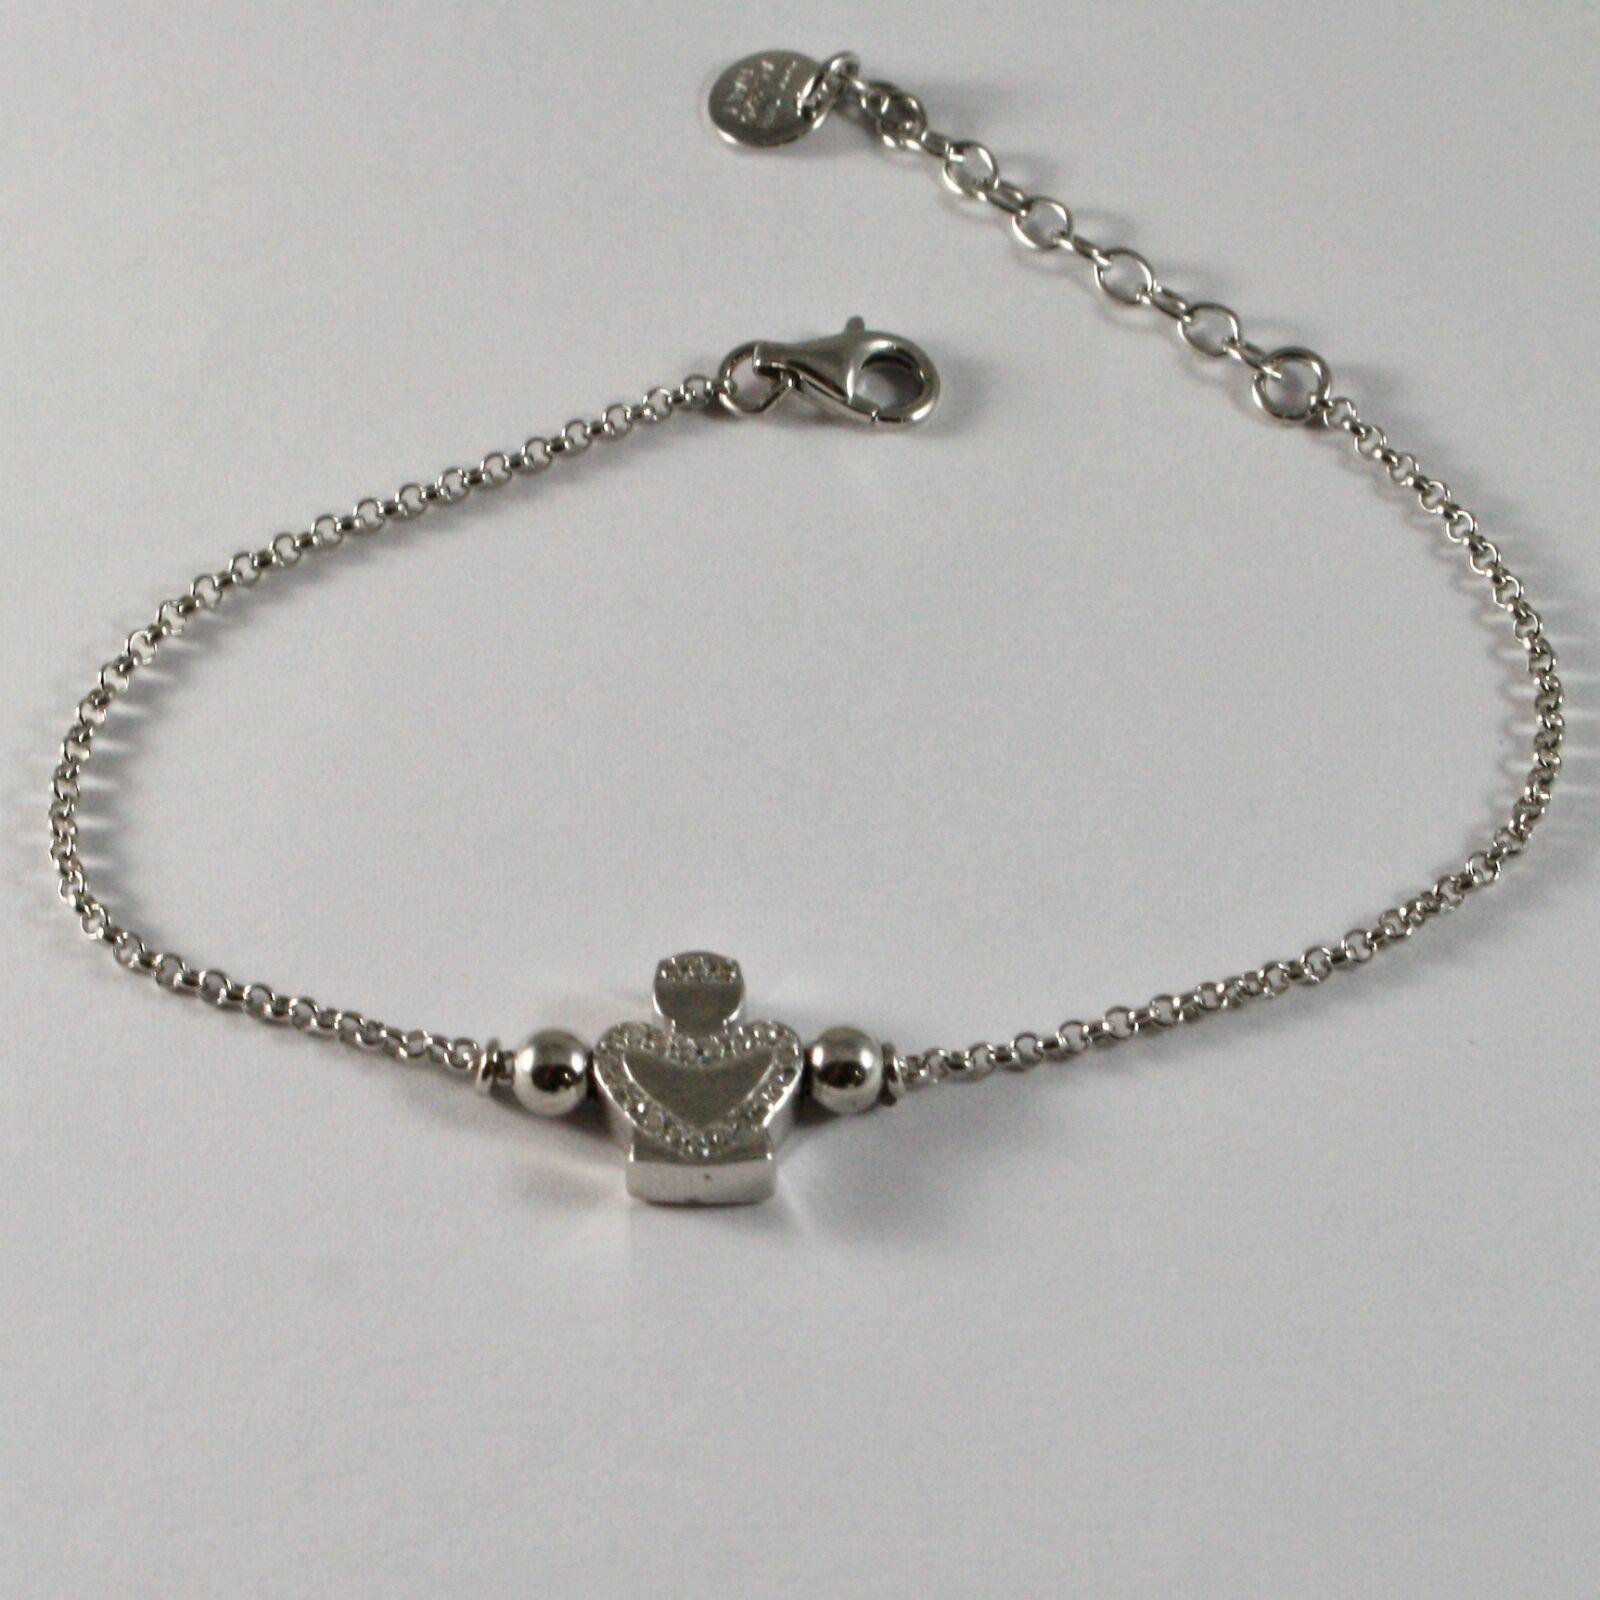 Silver 925 Bracelet Jack&co with Angel Stylized and Zirconia Cubic Jcb0852